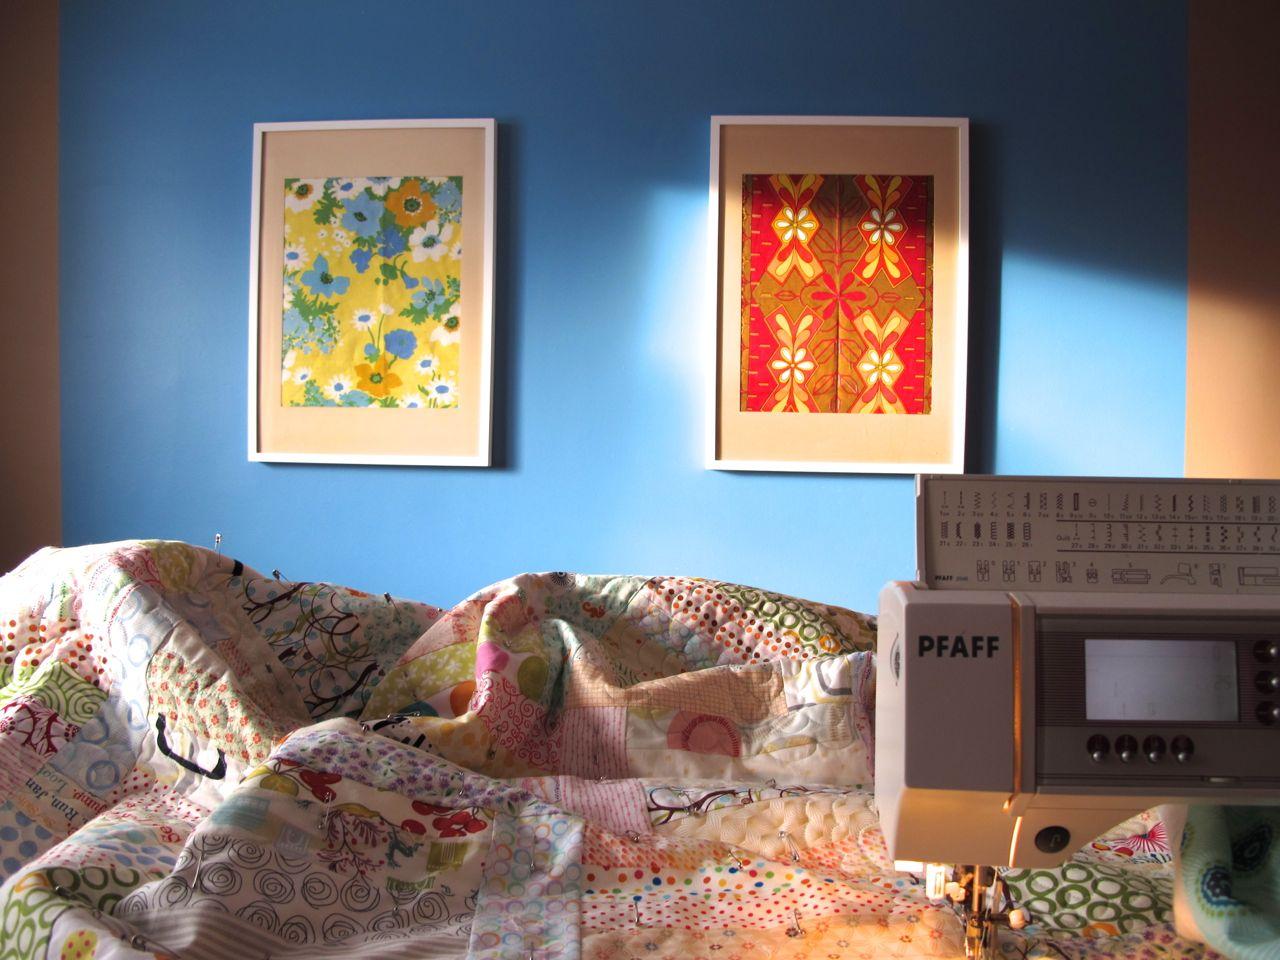 Dining Room Empire: Ten Tips for Machine Quilting Large Quilts : machine quilting a large quilt - Adamdwight.com